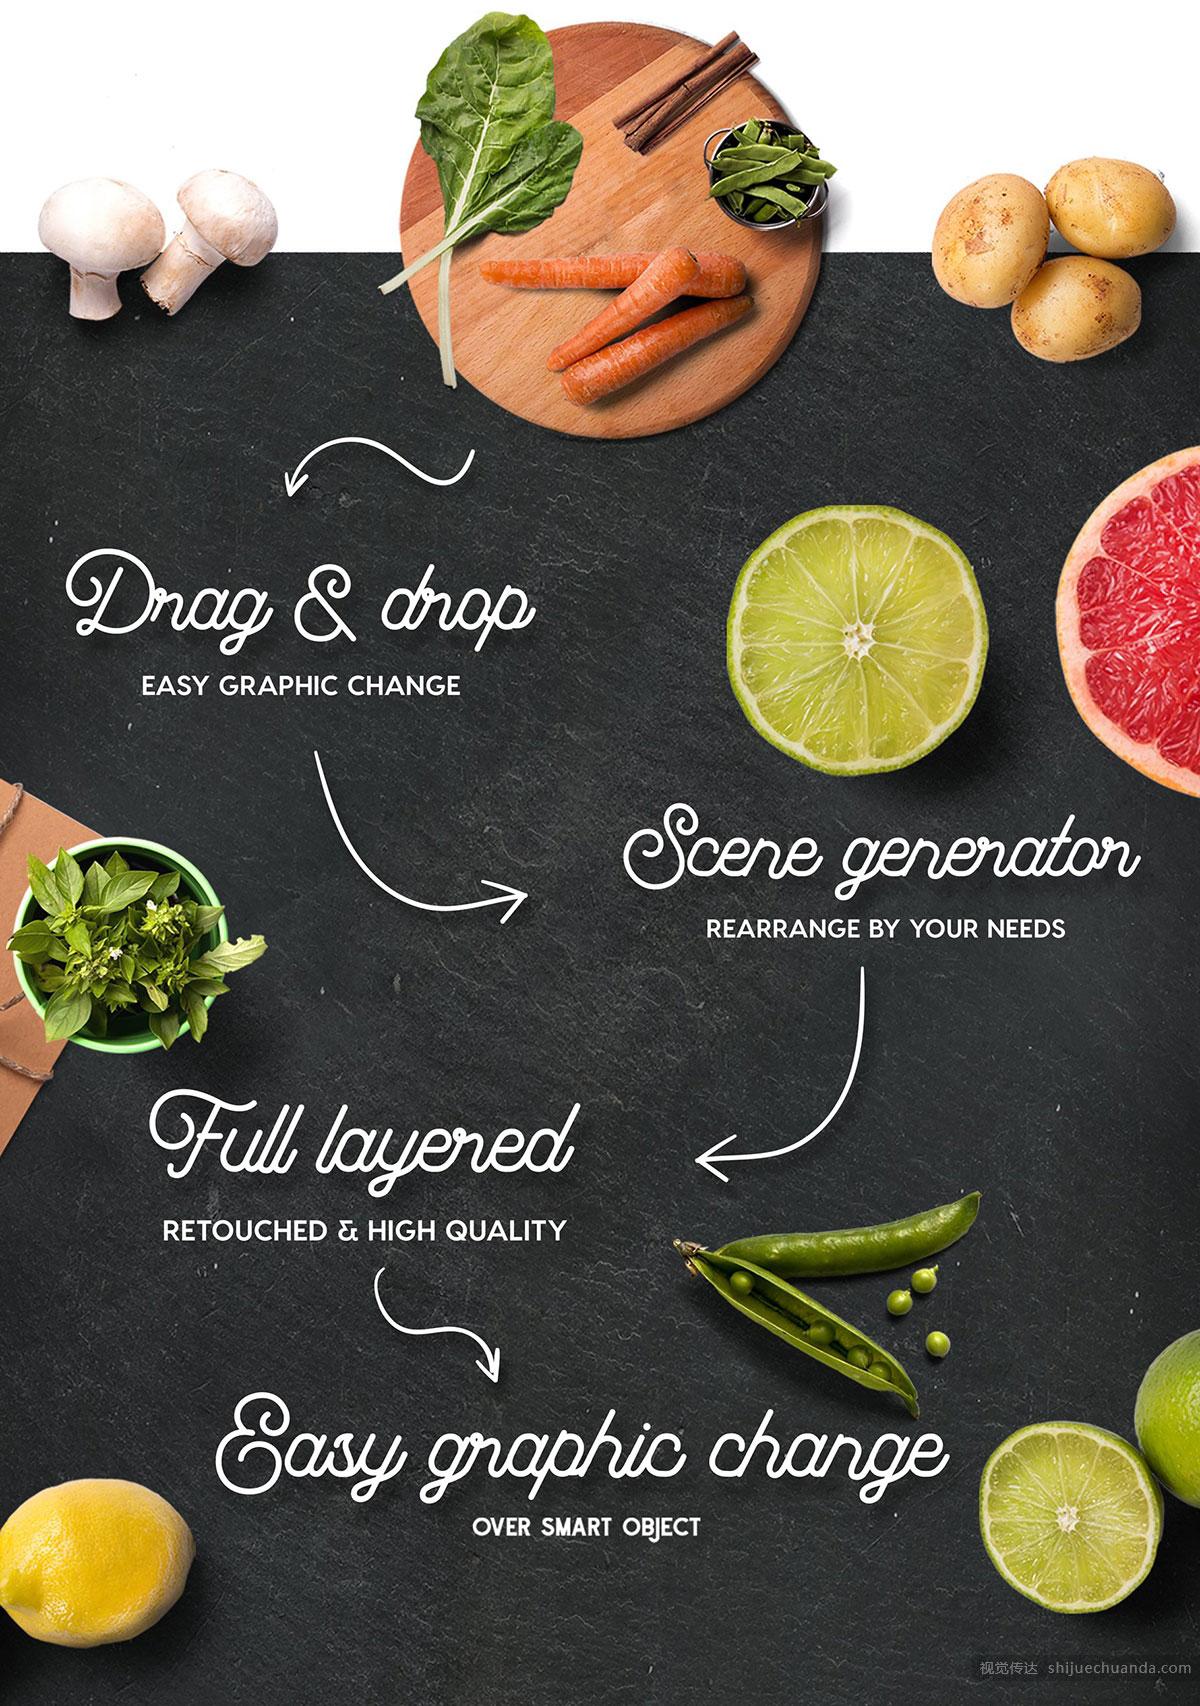 有机食品场景模型样机 Organic Food Scene Generator